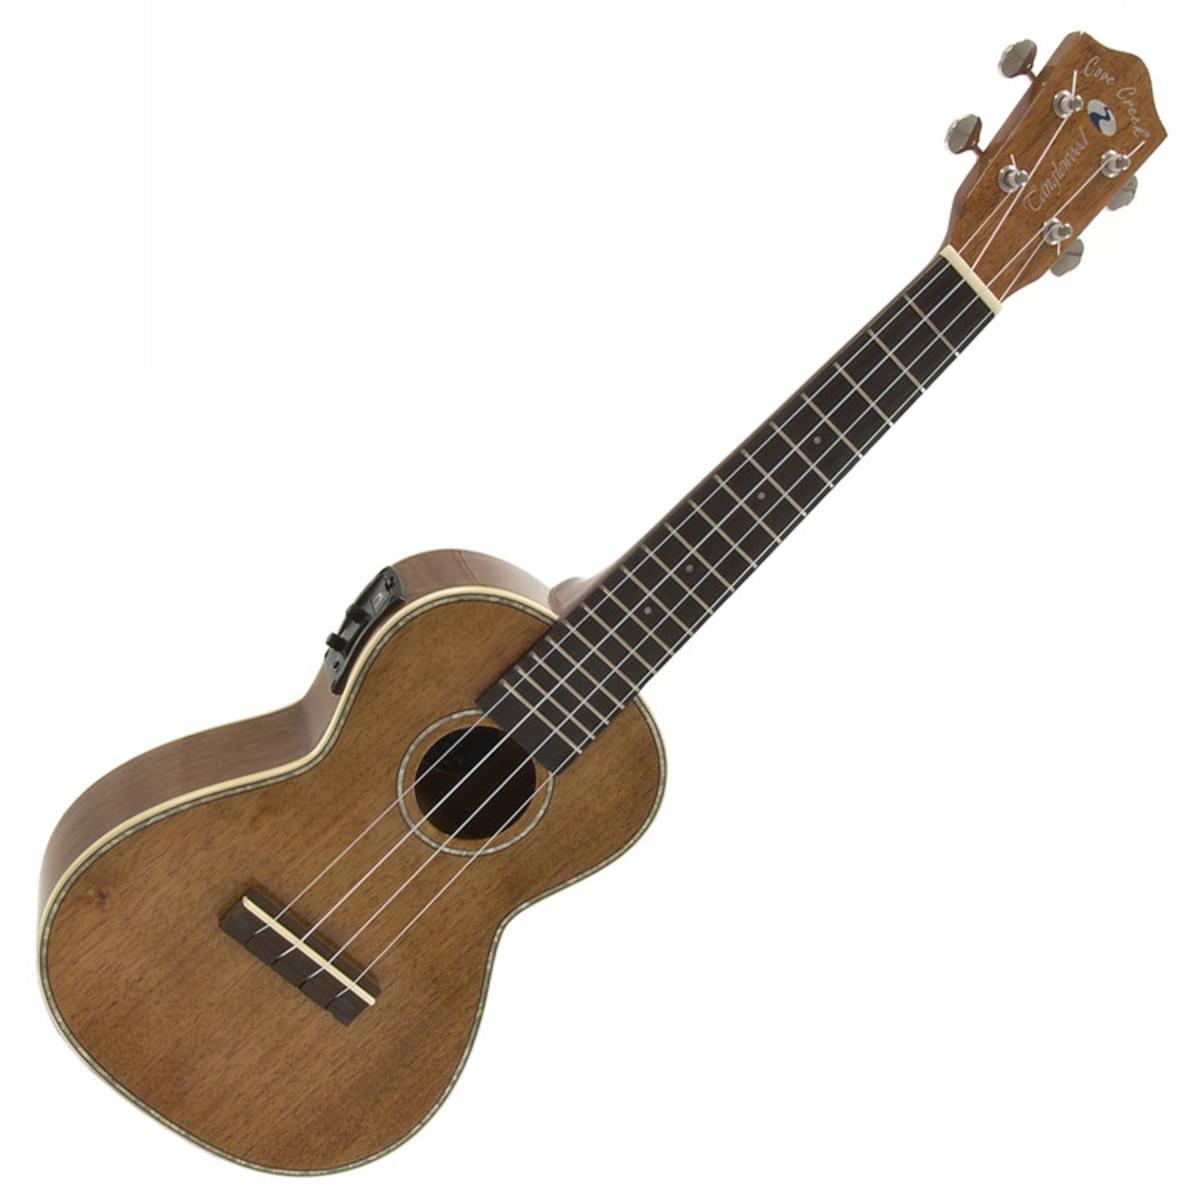 Tanglewood tu 9e cove creek series concert electro ukulele for The tanglewood